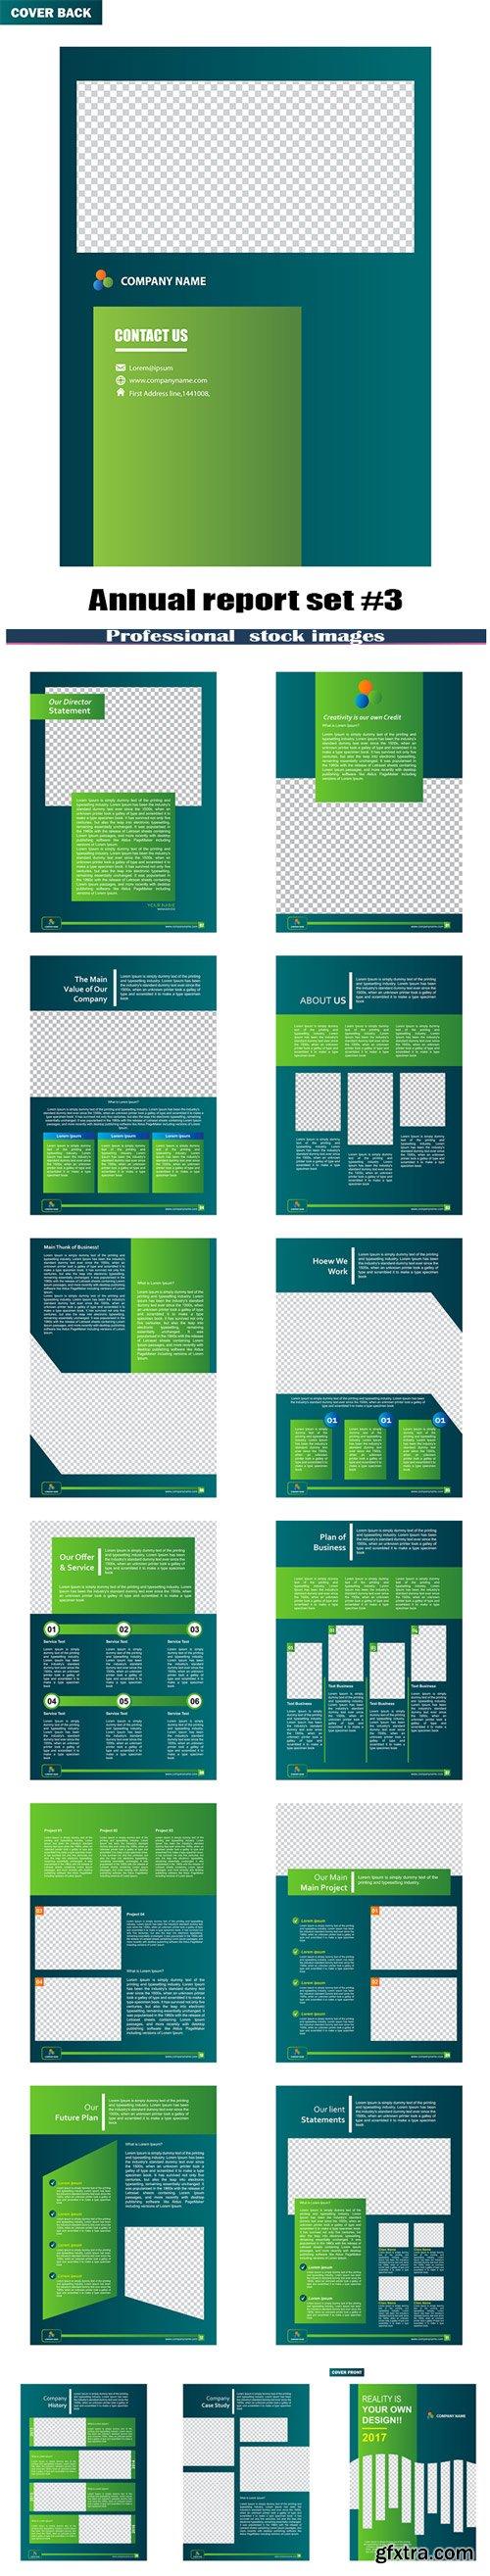 Annual report set #3